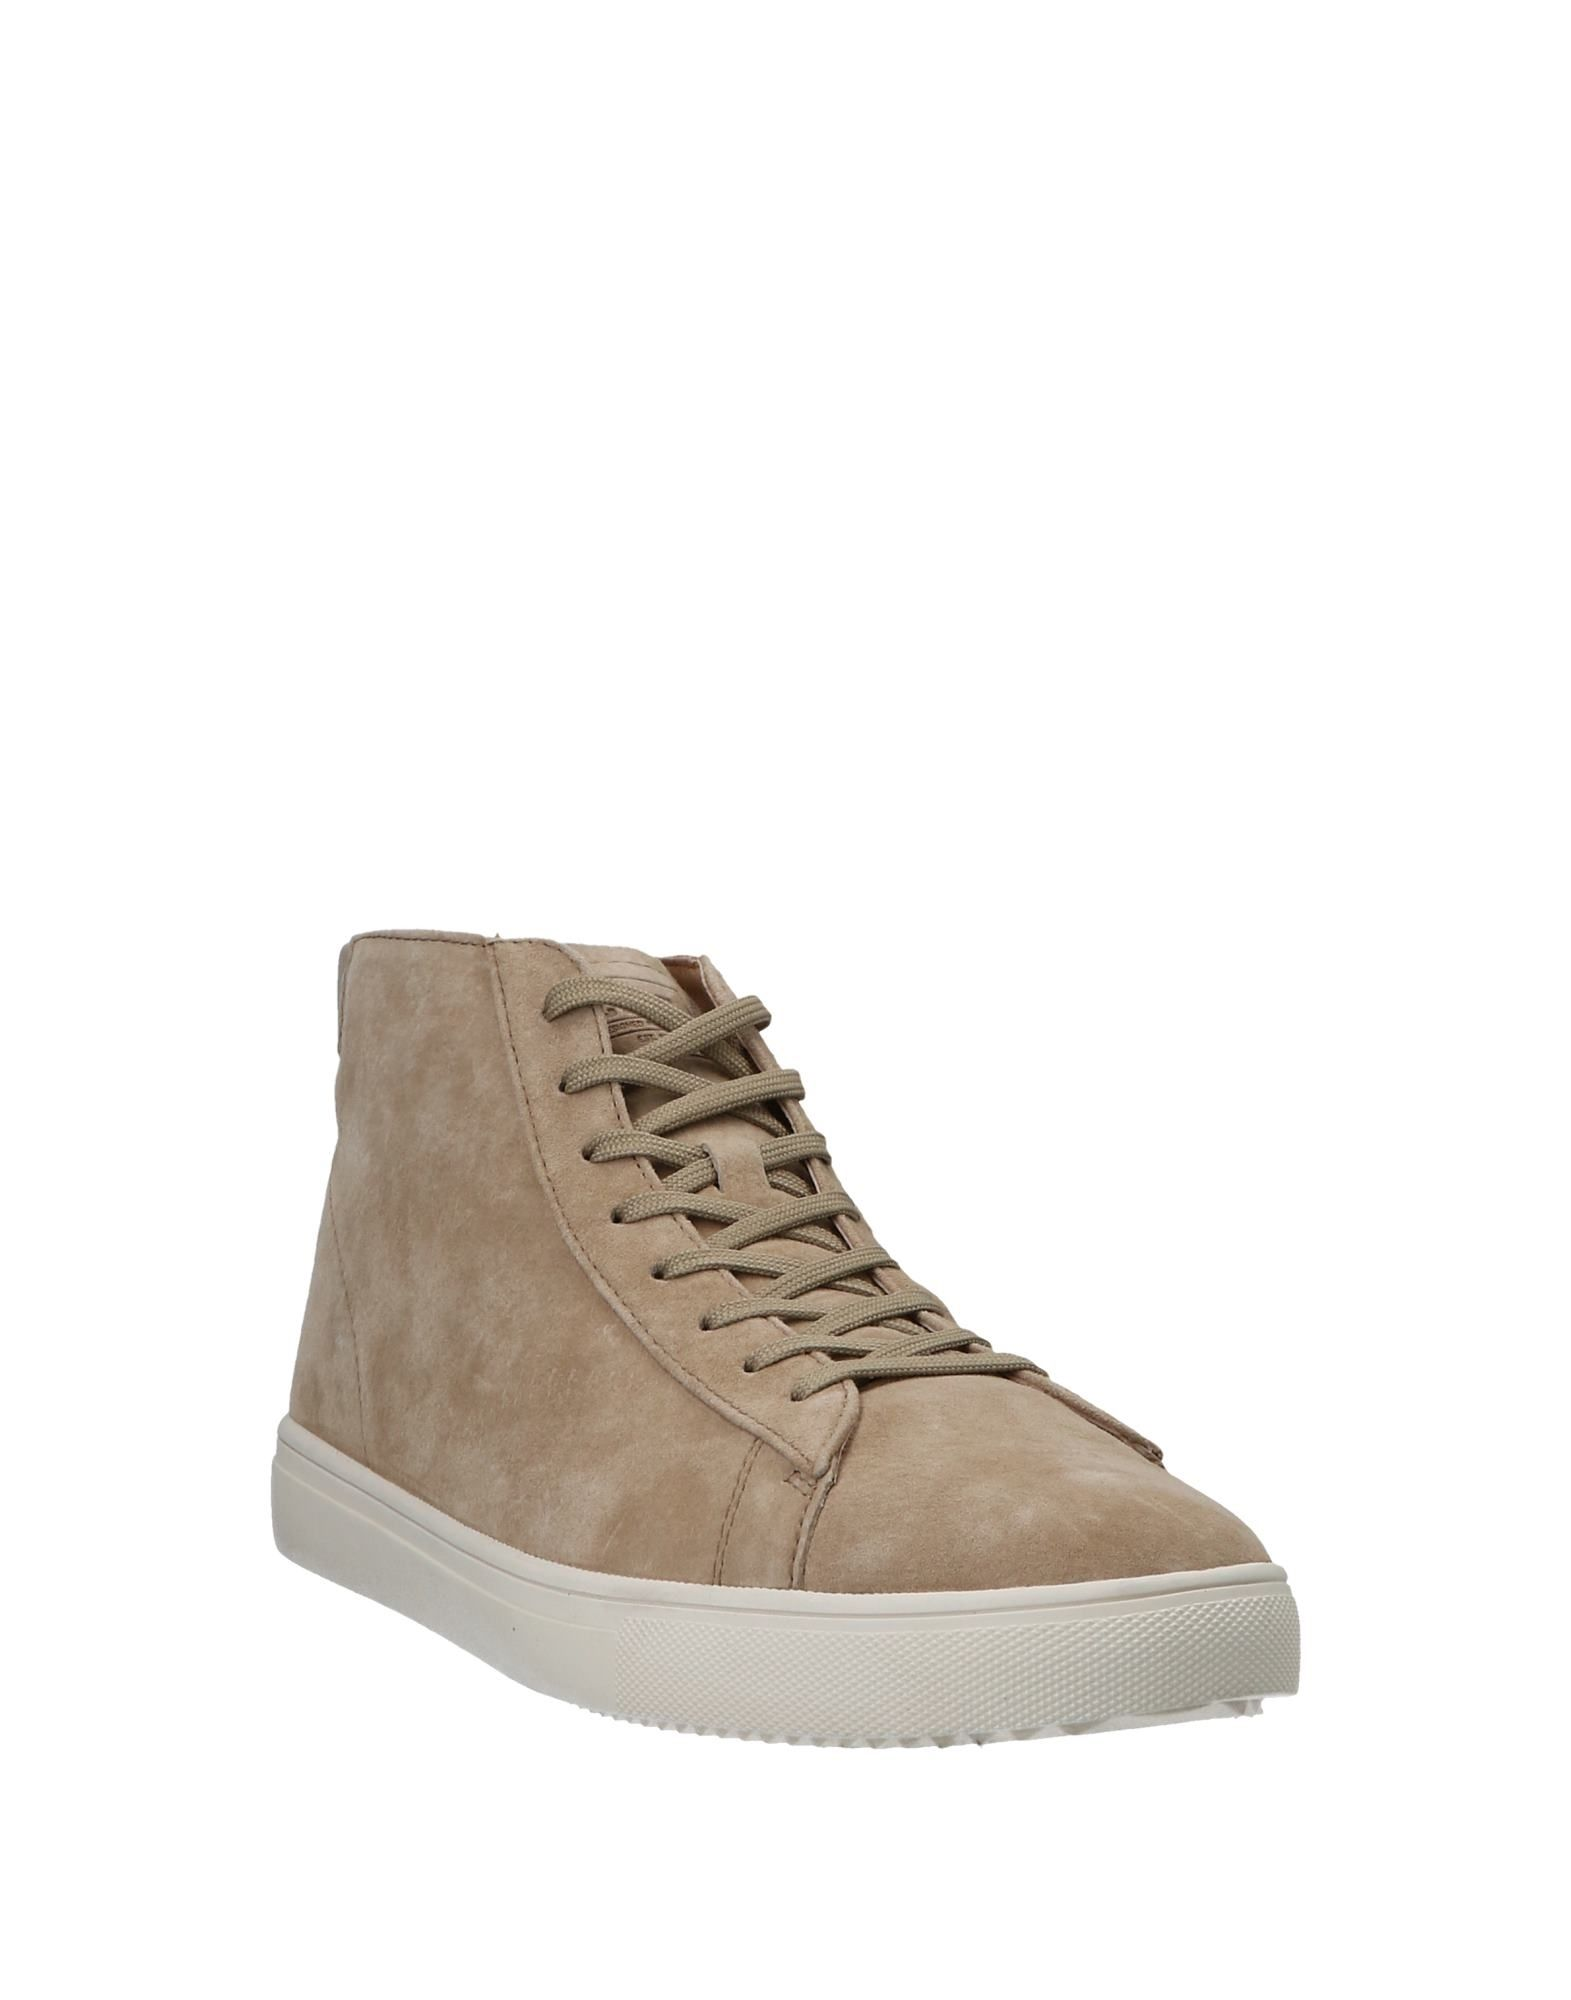 Rabatt echte Schuhe Herren Clae Sneakers Herren Schuhe  11554873EA 9dfc53